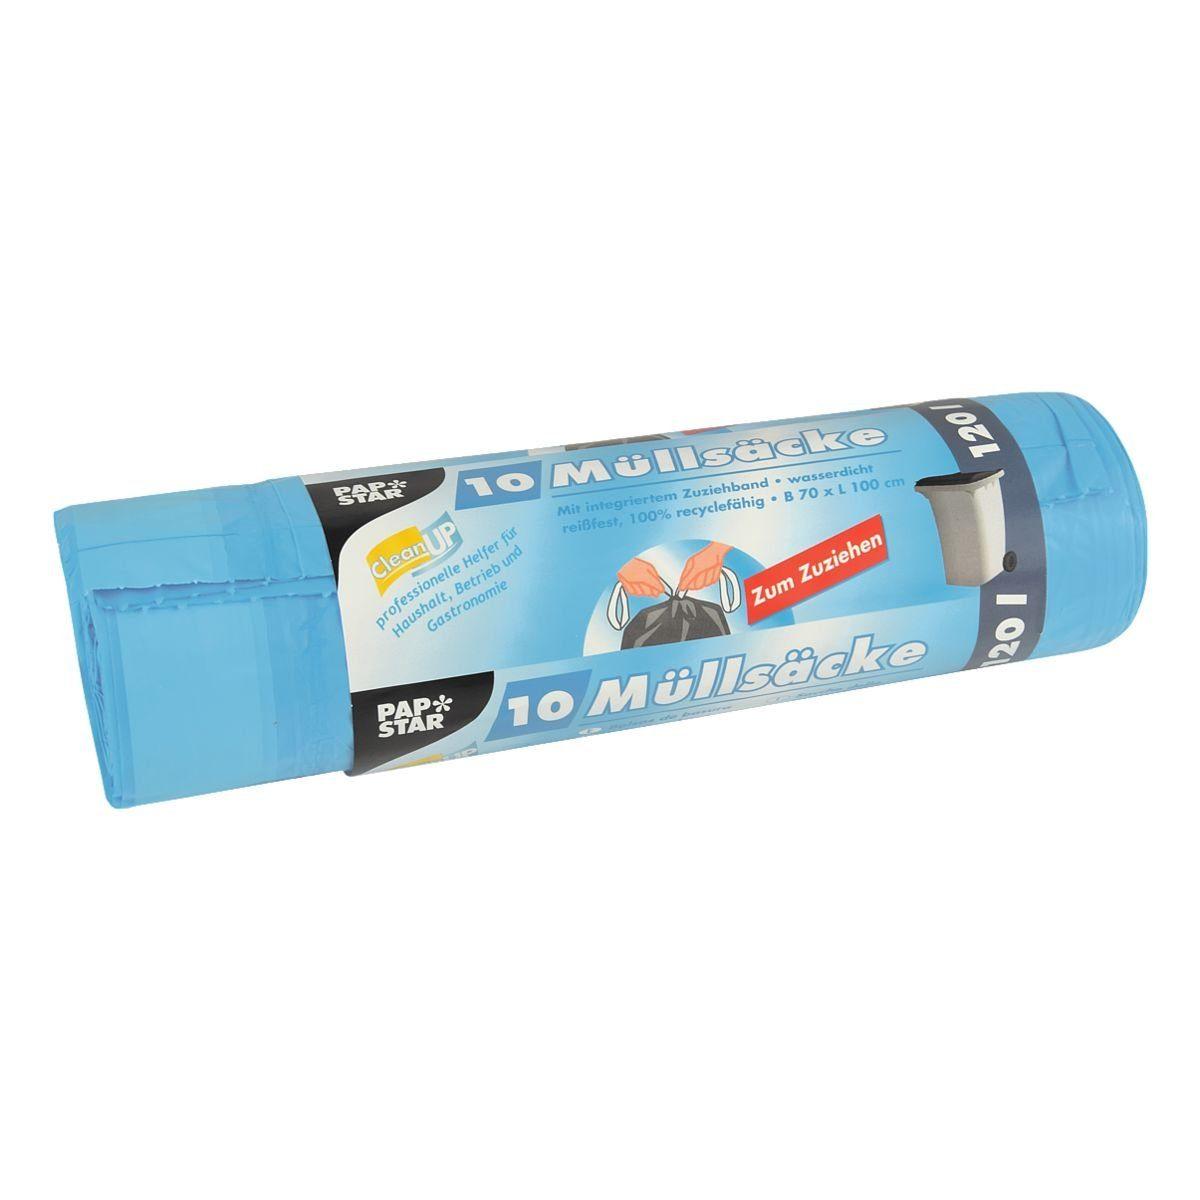 PAPSTAR 10 Müllsäcke mit Zugband 120 L blau